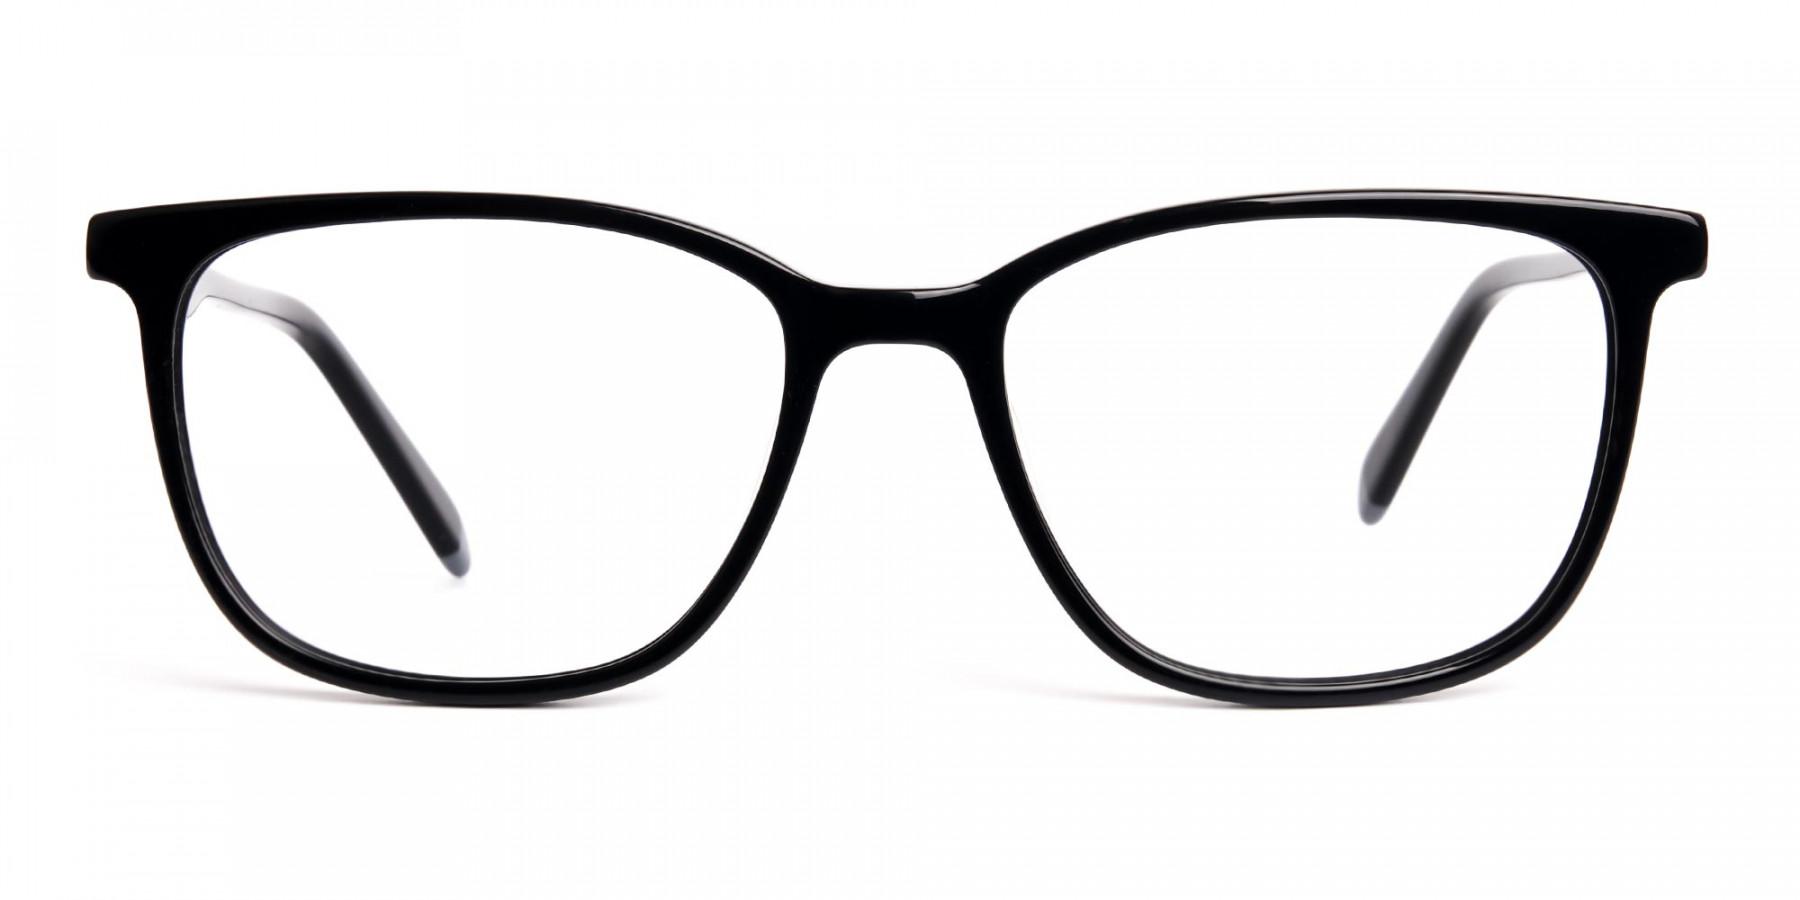 New-shiny-and-glossy-Black-Wayfarer-and-Rectangular-Glasses-Frames-1